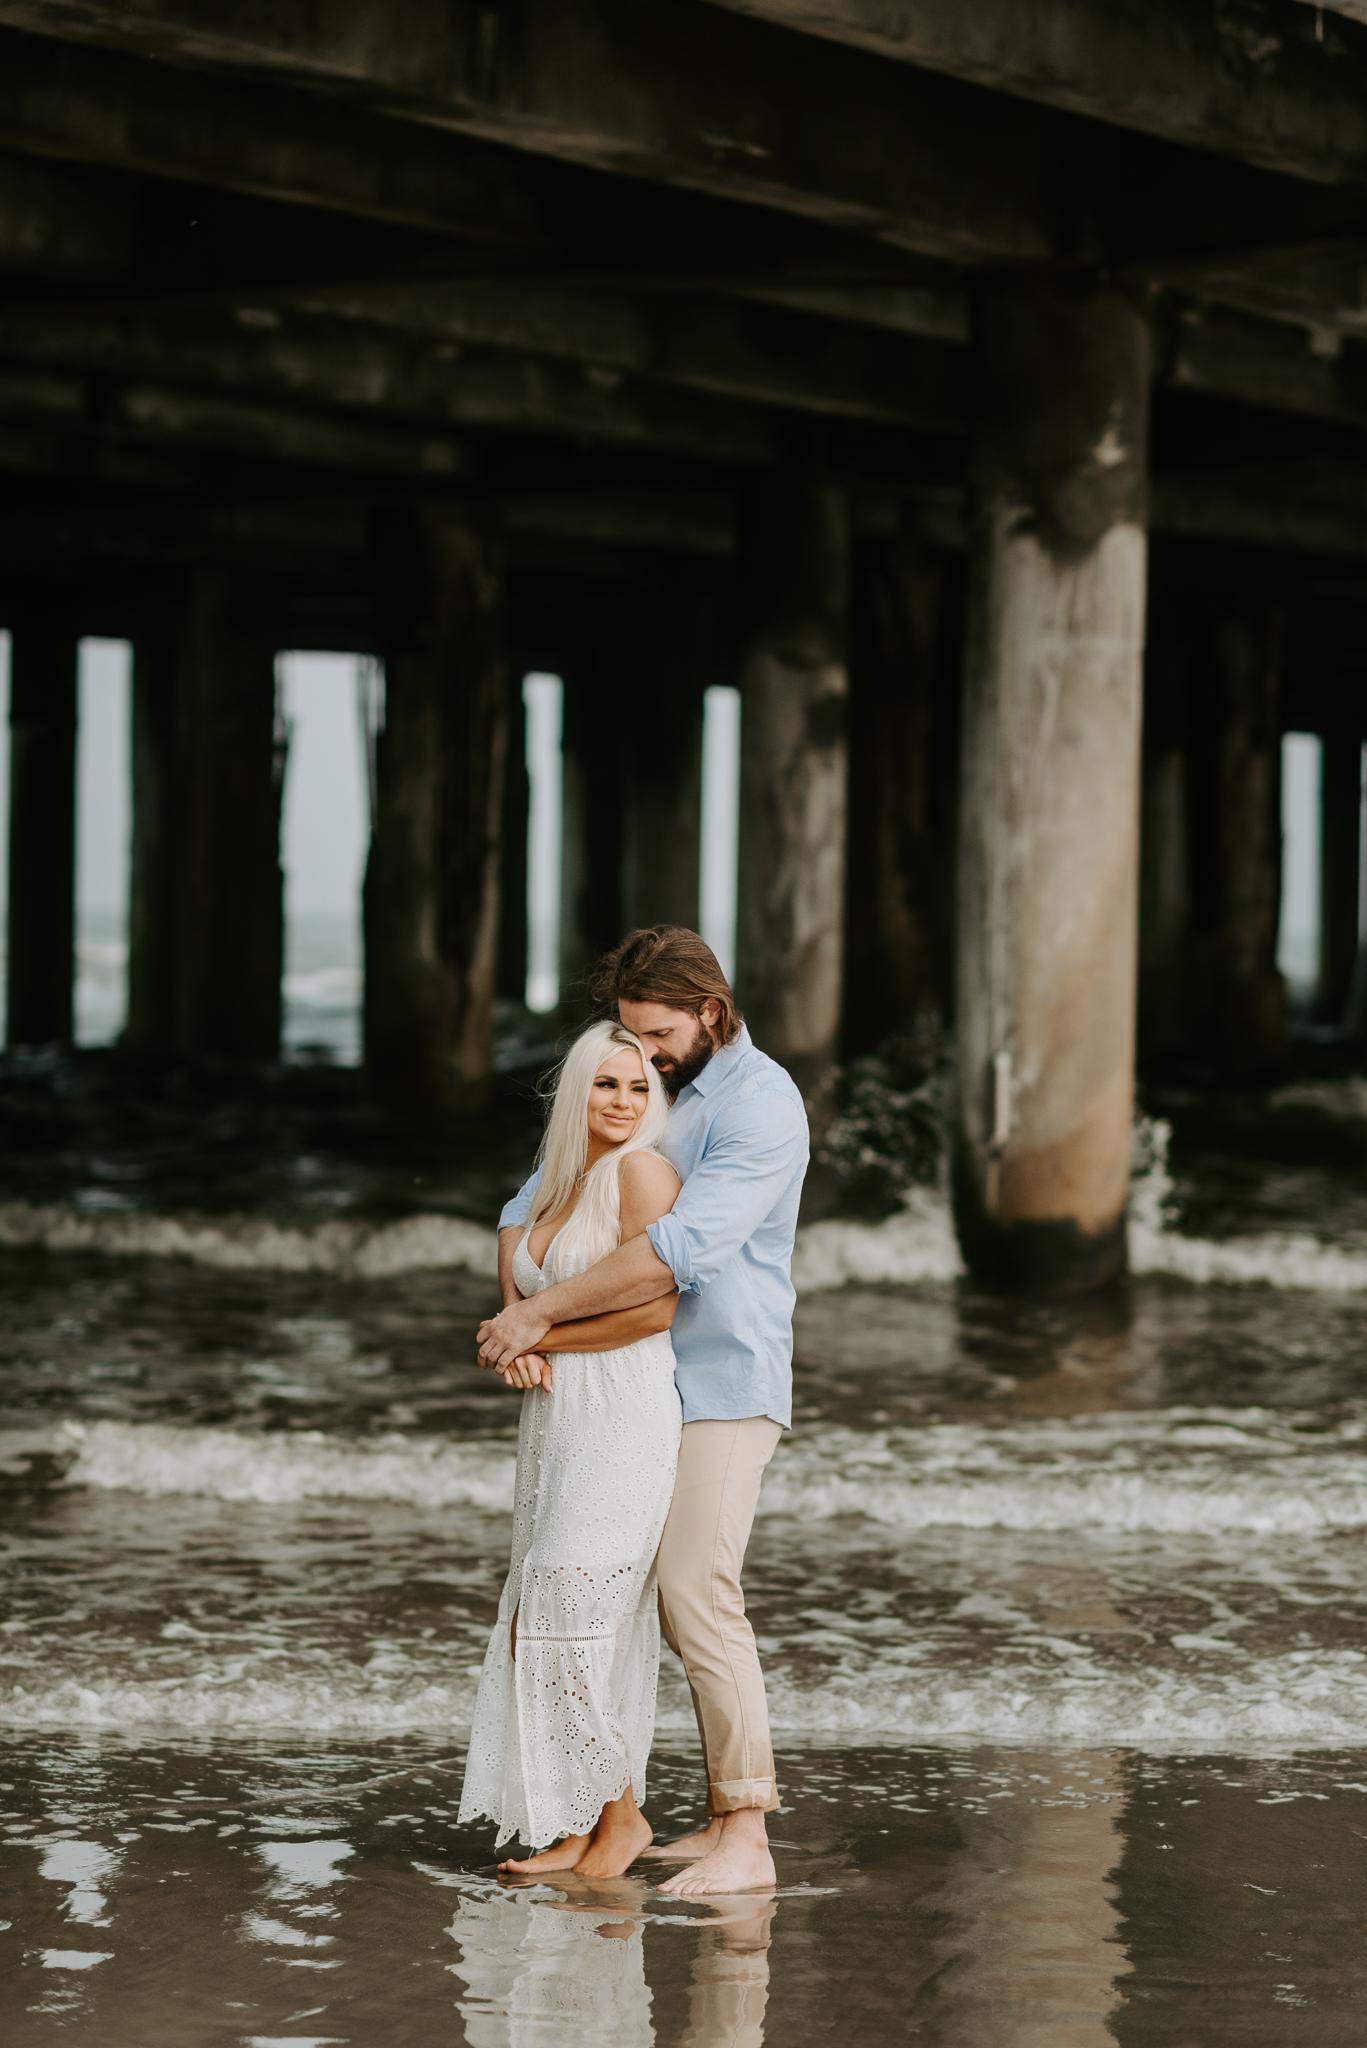 Ashley + Charles - Galveston Texas Moody Engagement Session | Kristen Giles Photography - 017.jpg